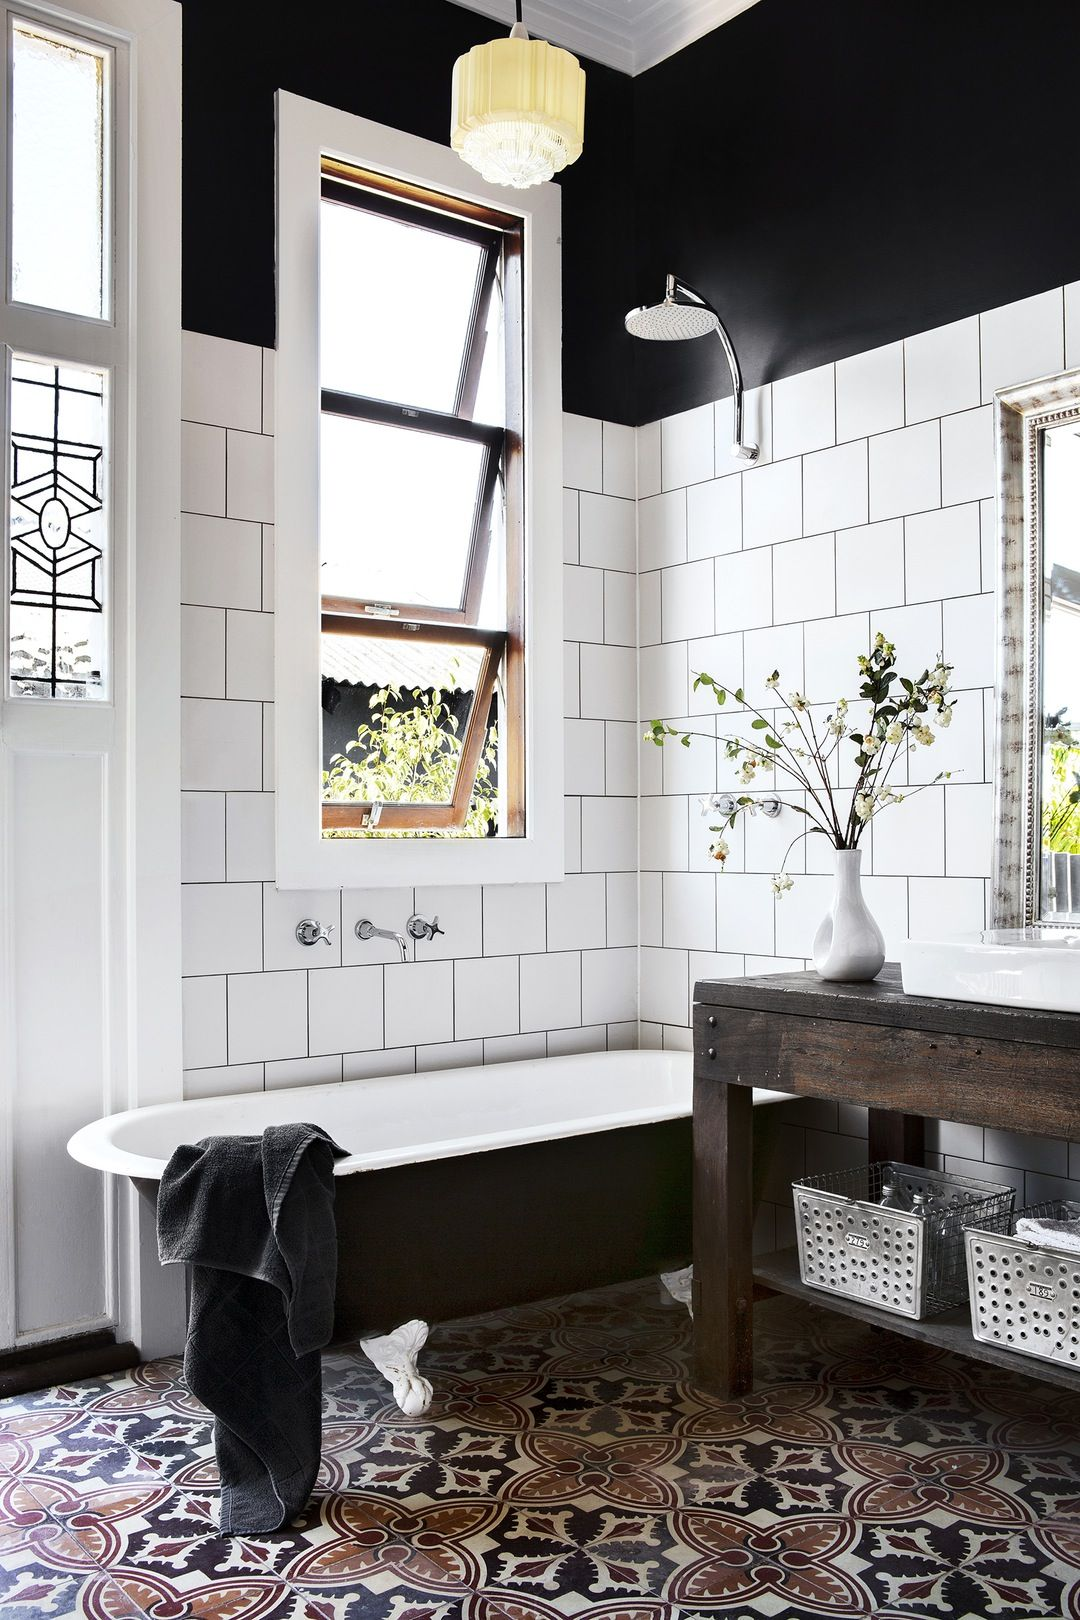 12 Ideas For Designing An Art Deco Bathroom in 2018 | Boss Chíc Home ...